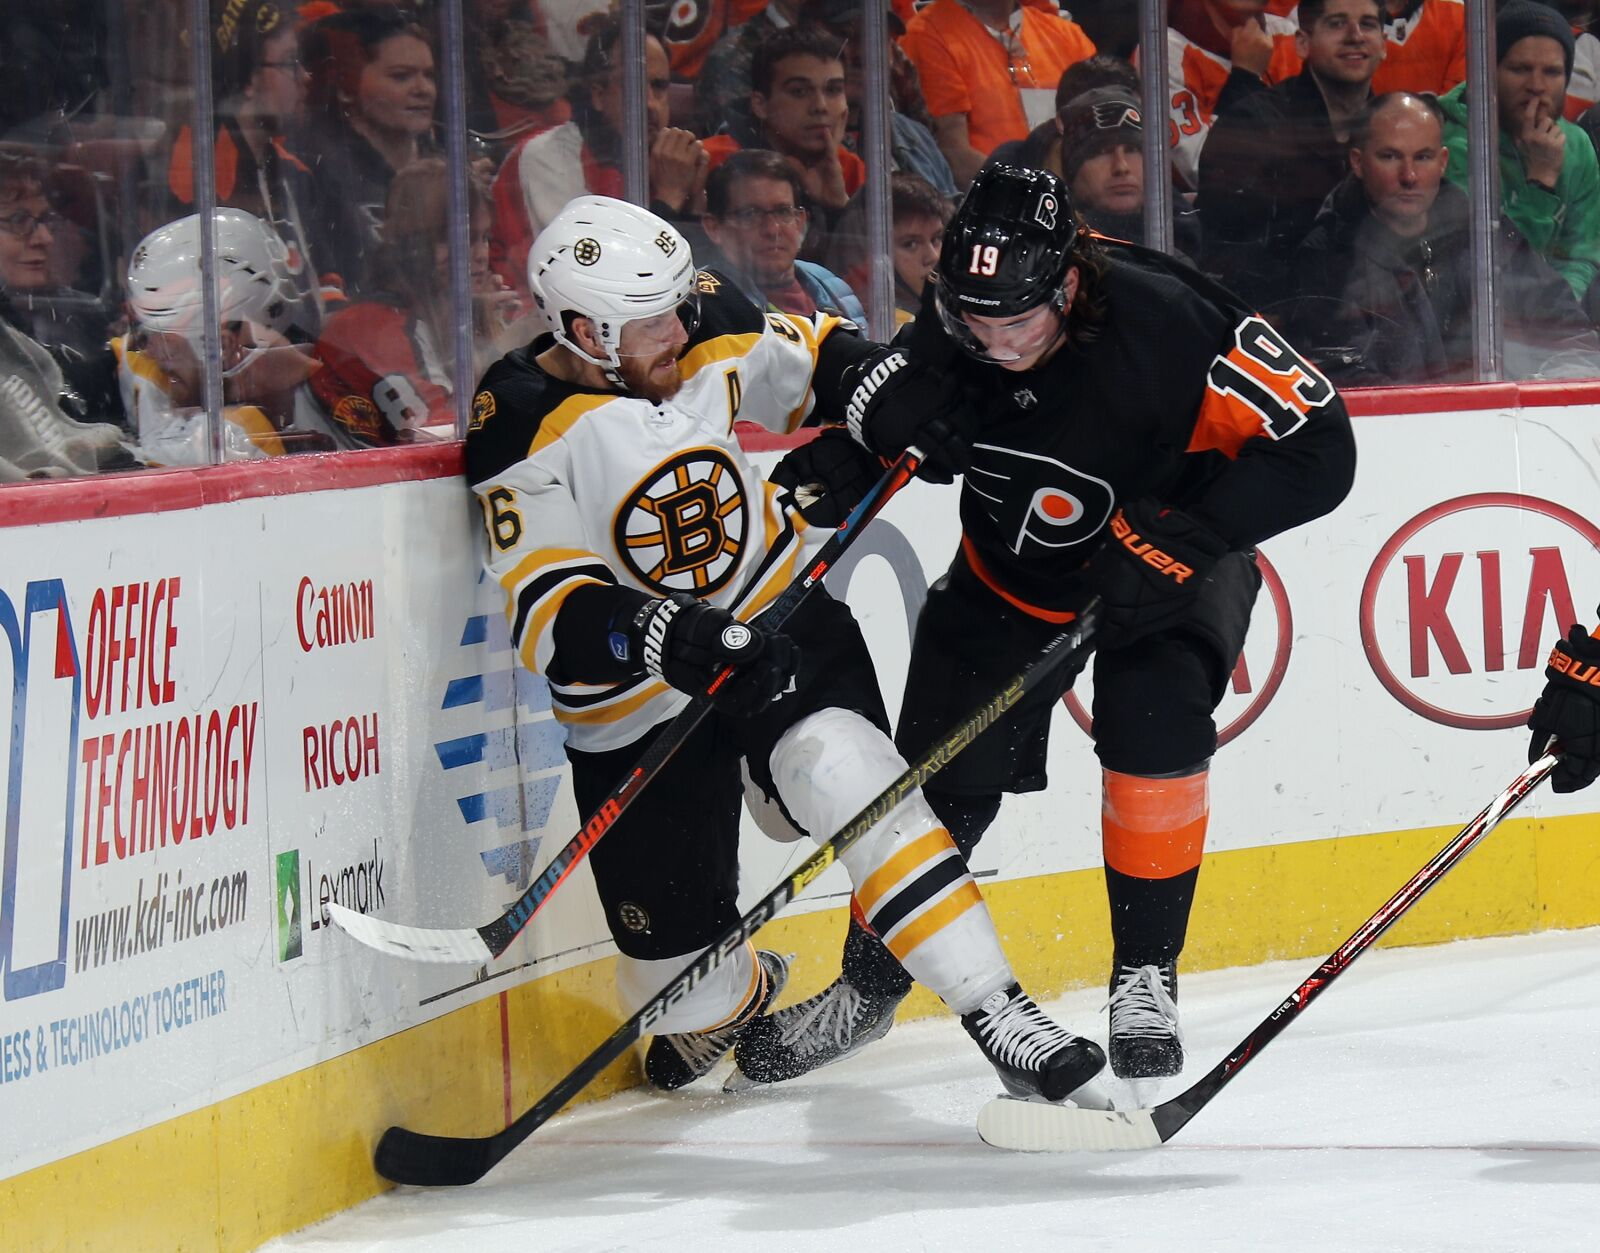 c7c7d417885fb Boston Bruins rumors  Kevan Miller out for playoffs